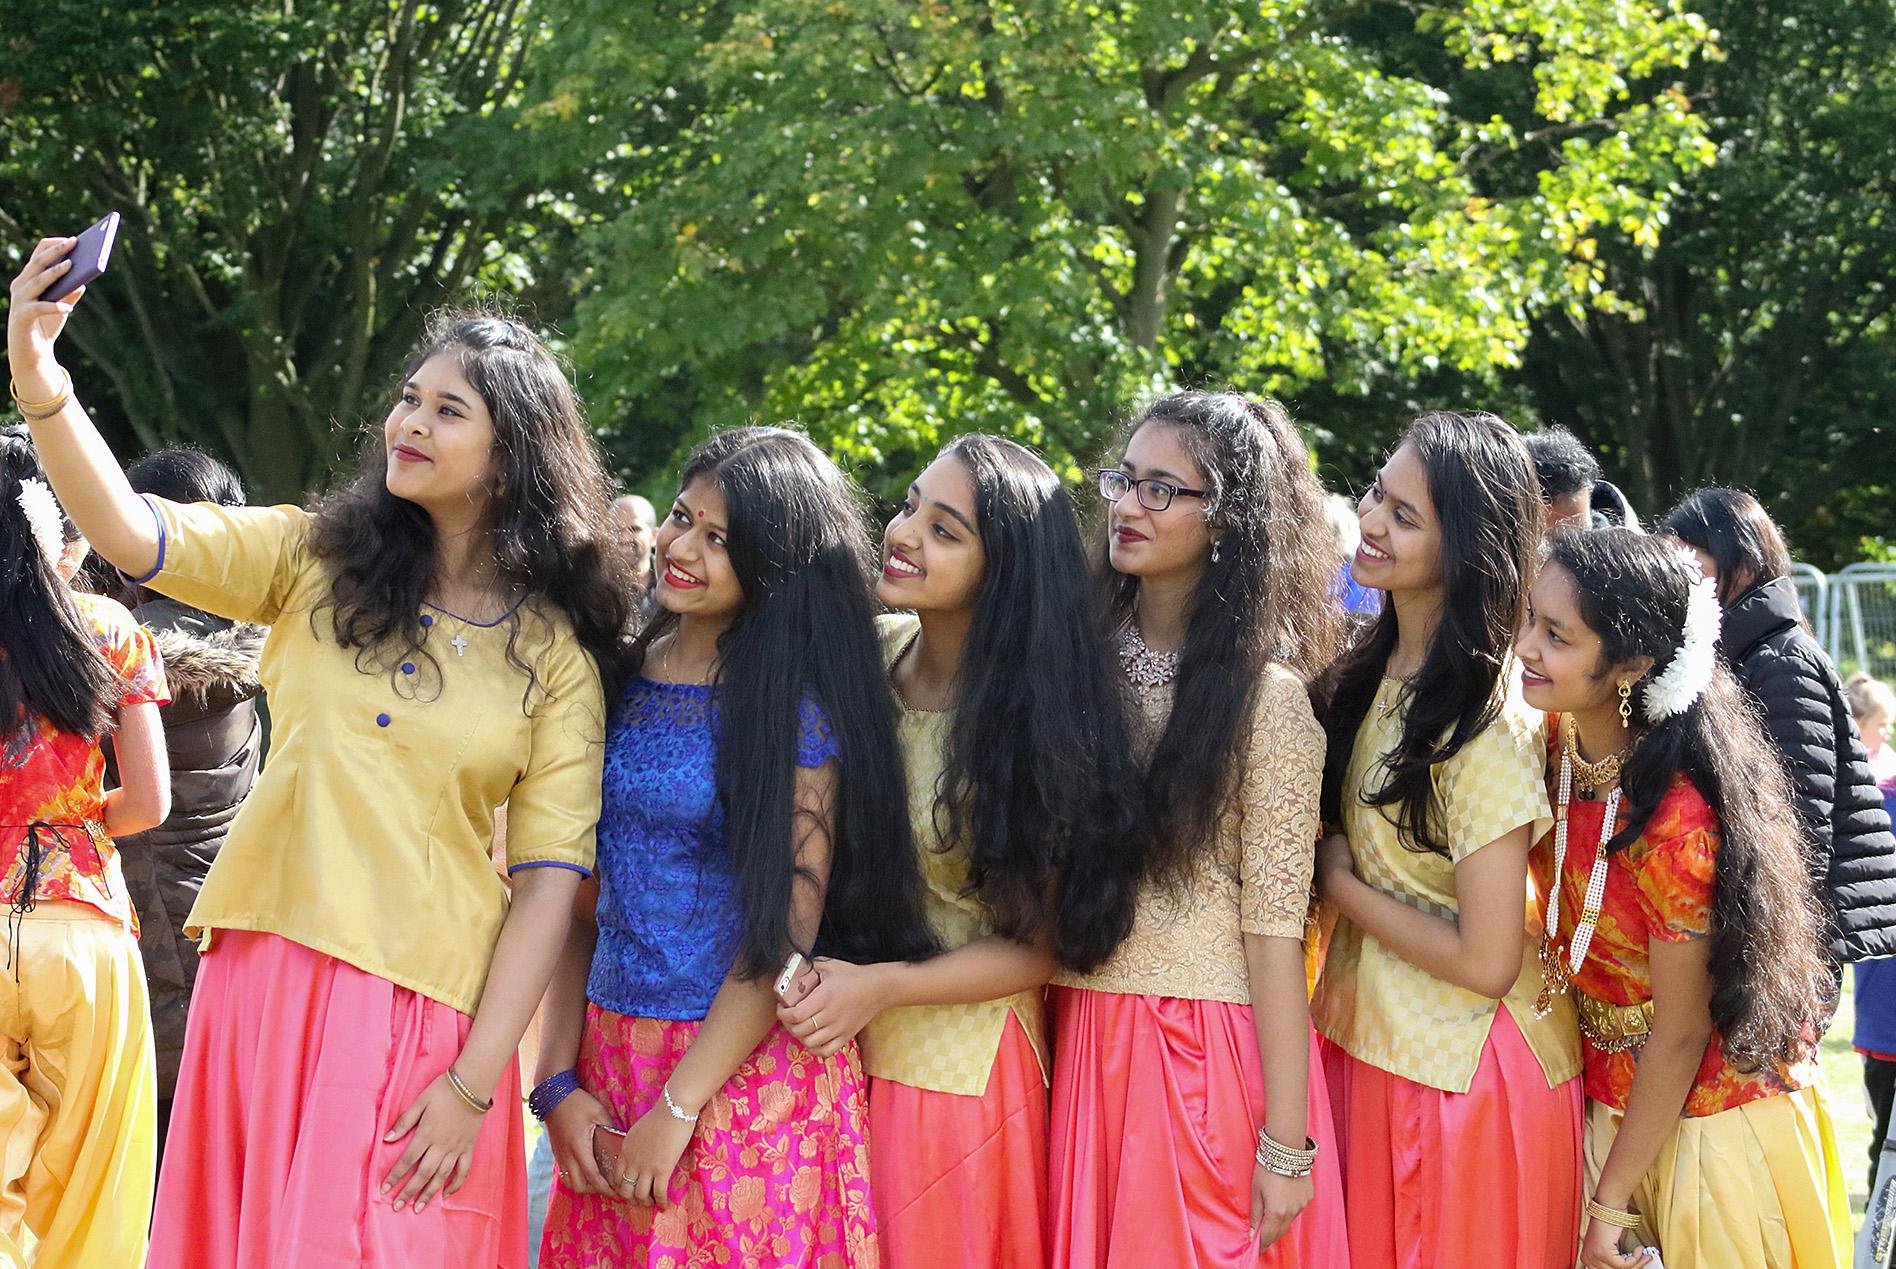 Belfast indian festival at falls park sat 22 9 18 13